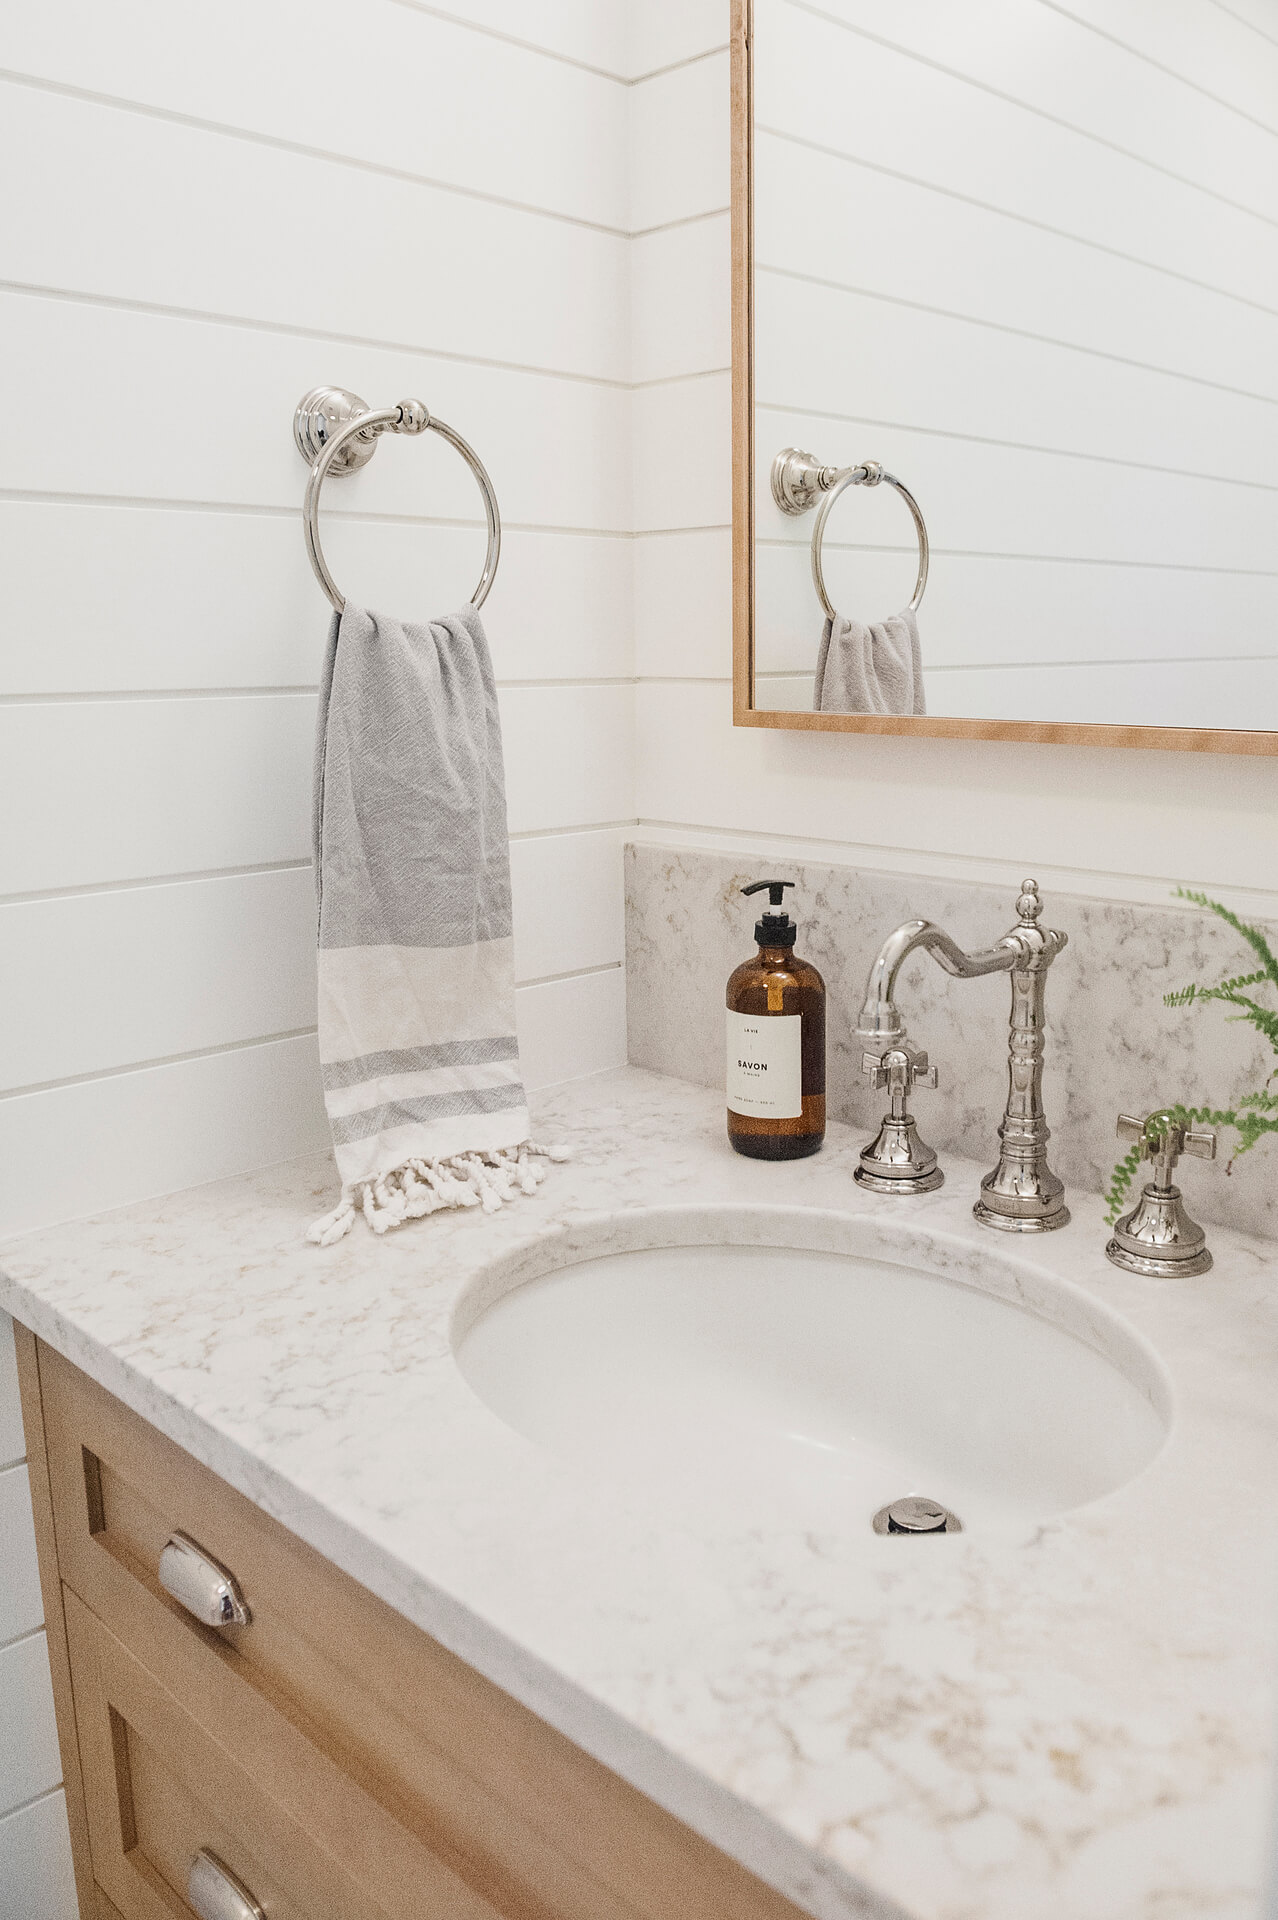 Frobisher AKB Design petite salle d eau vanite bois shiplap quartz19